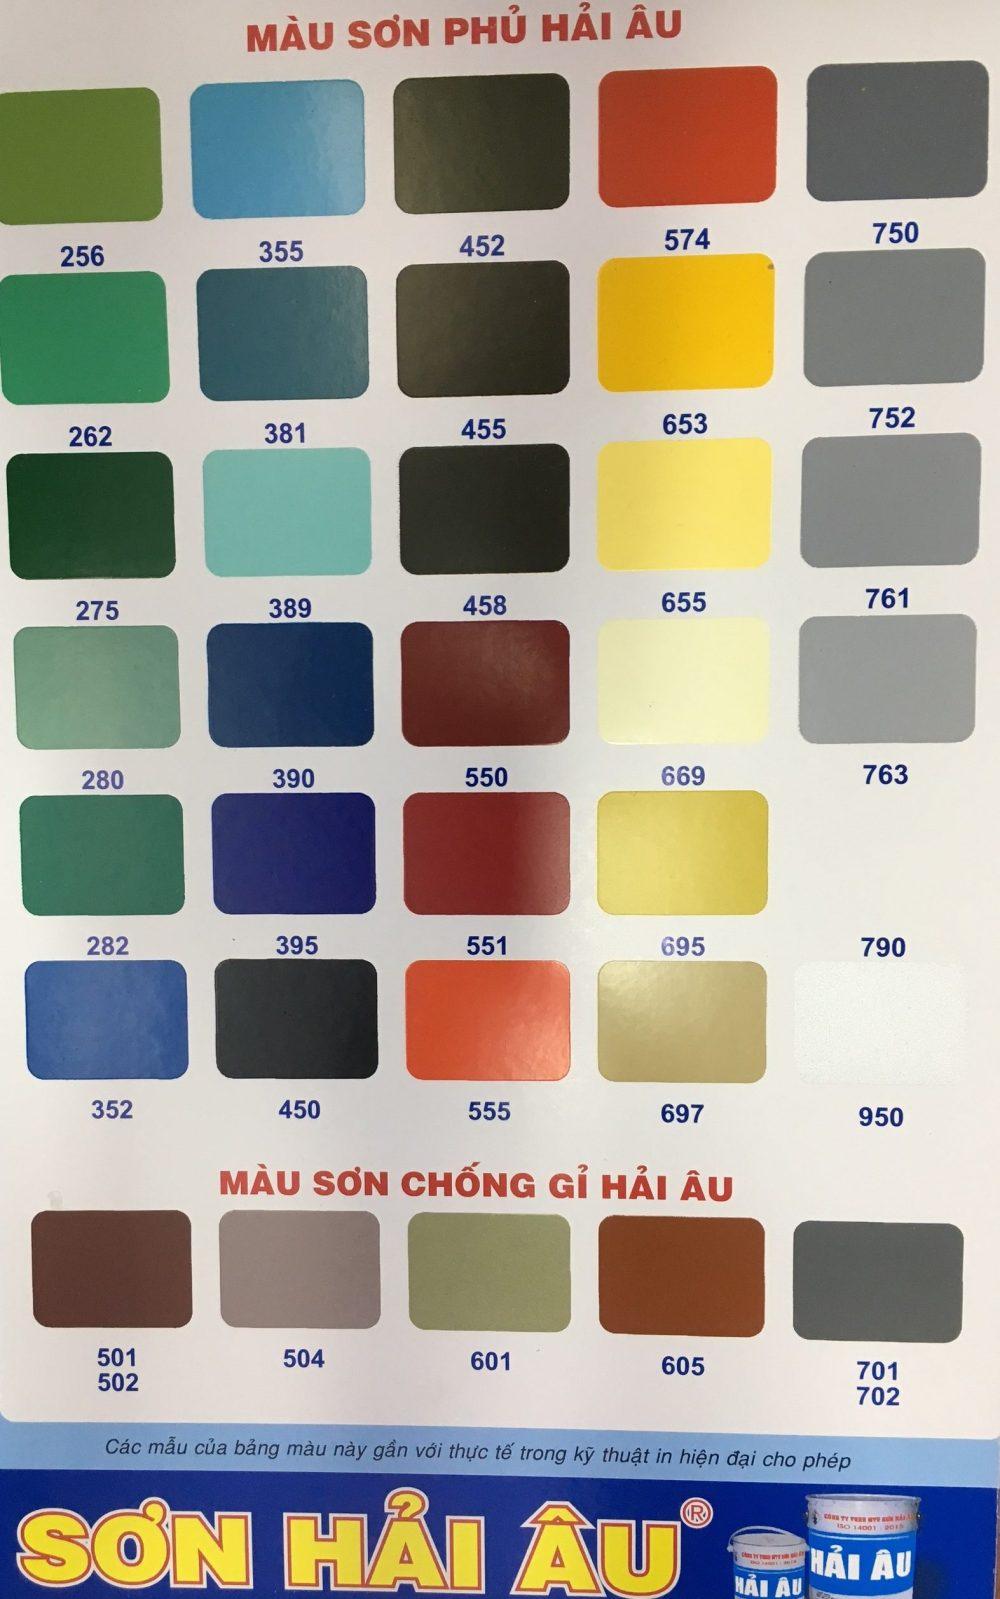 BANG MAU SON HAI AU - (36)